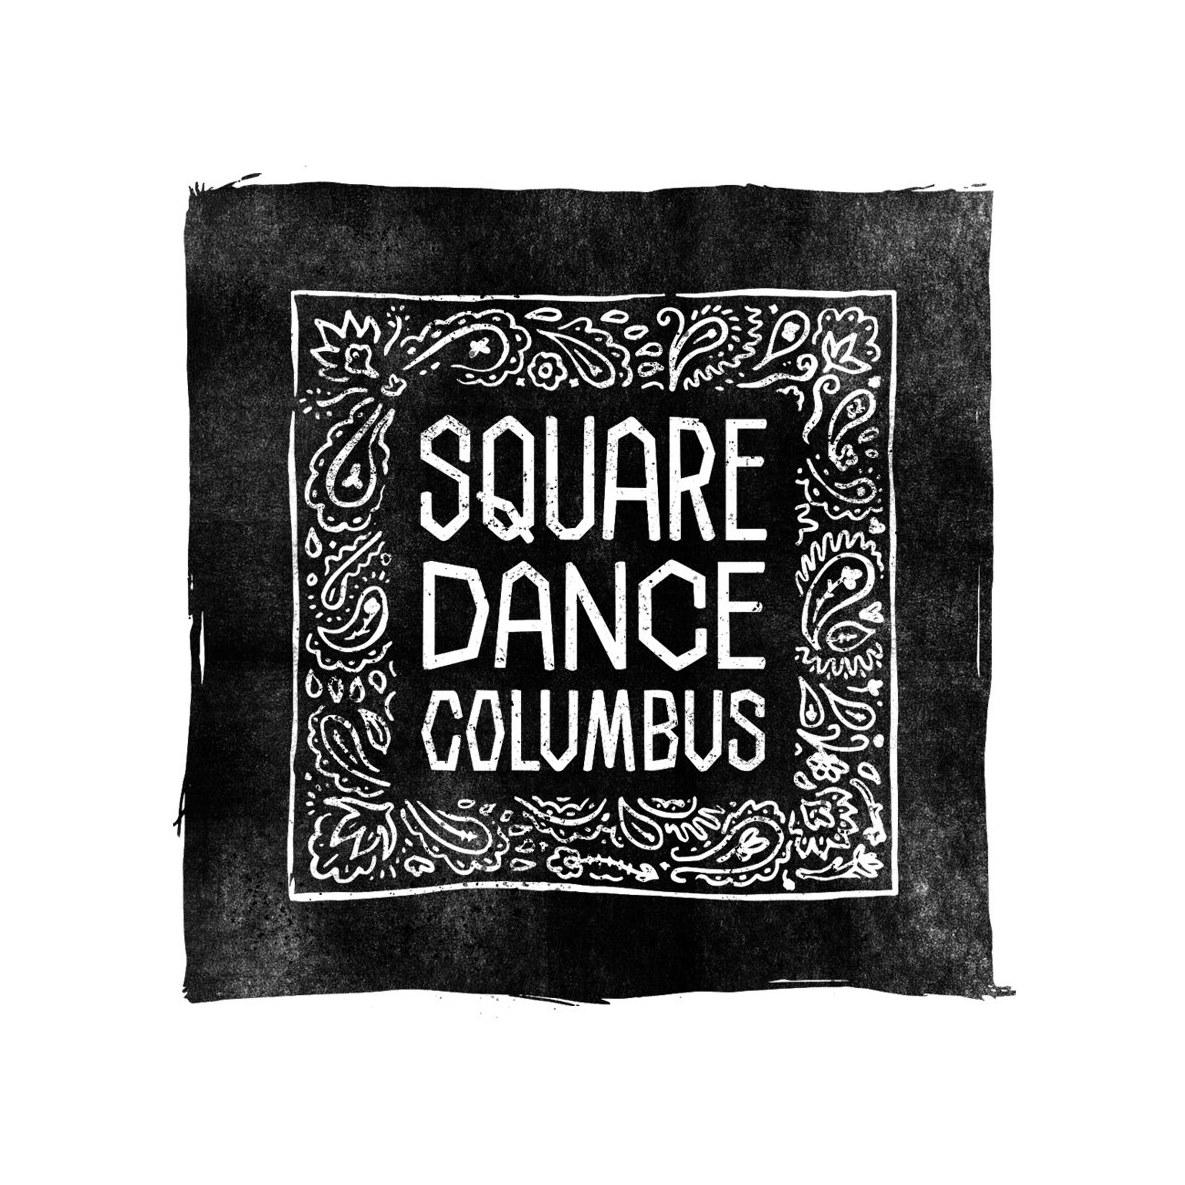 square dance columbus logo.jpg